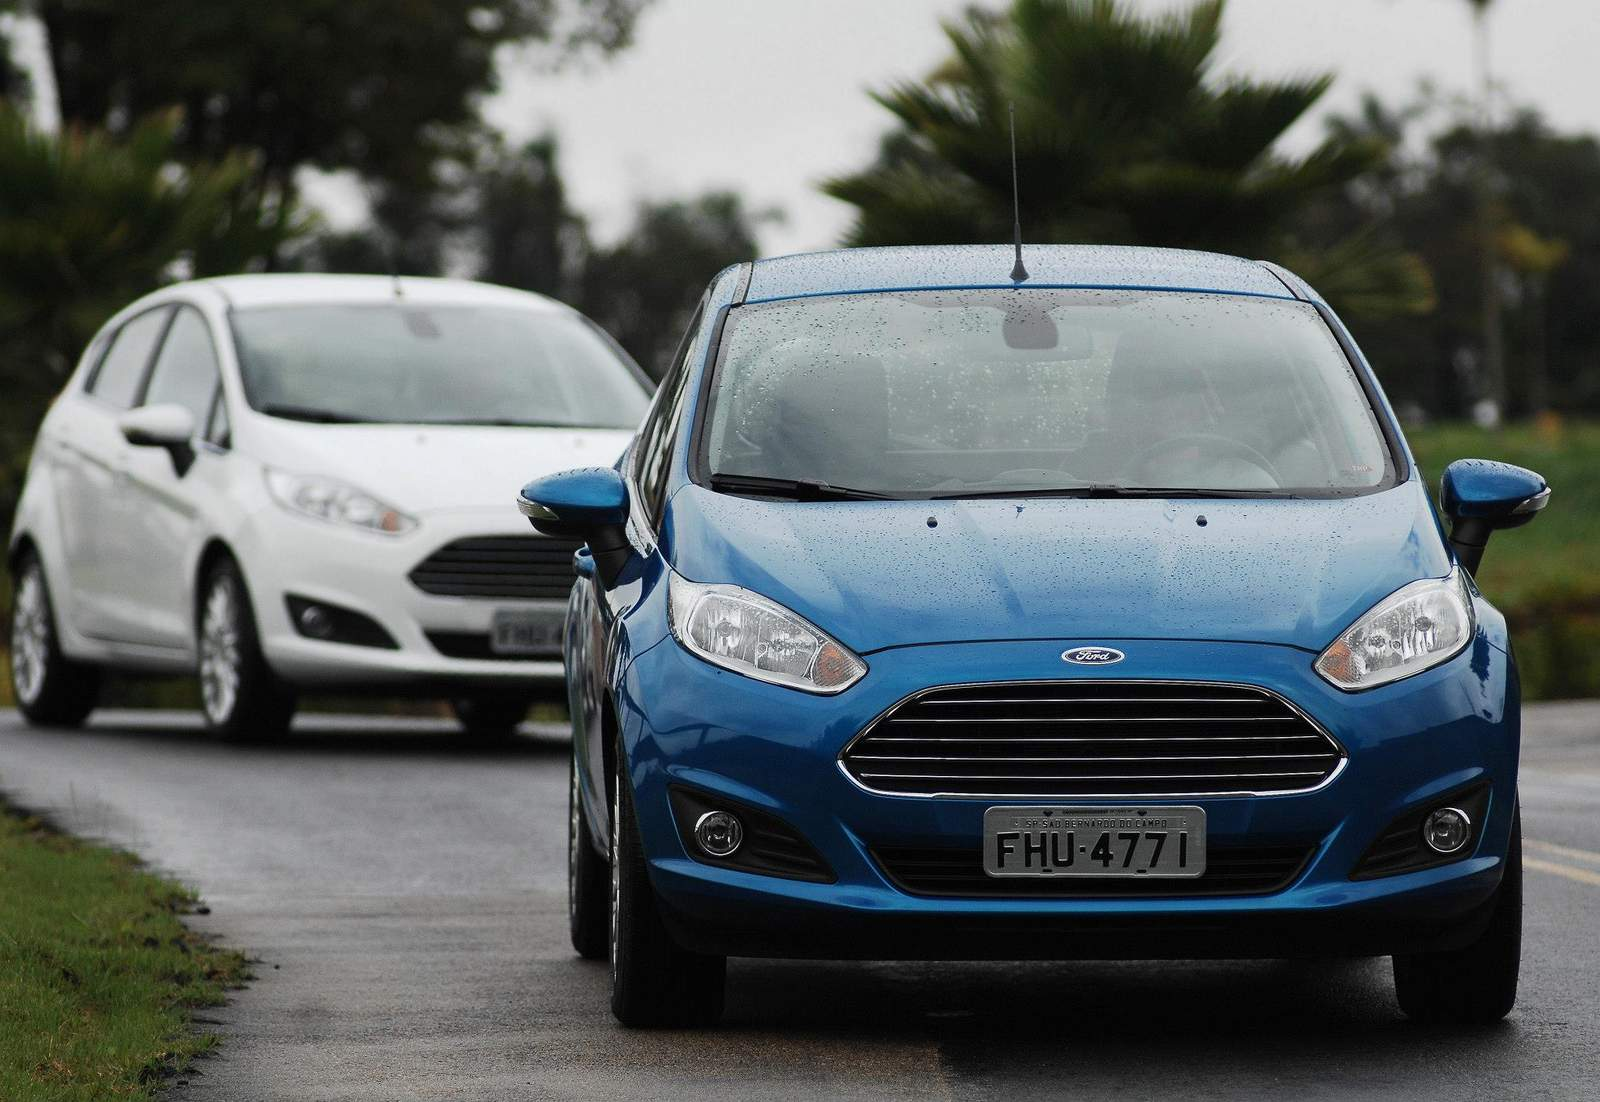 Novo Fiesta 2014 1.5 S x Gol 1.6 x Palio - comparativo de consumo e